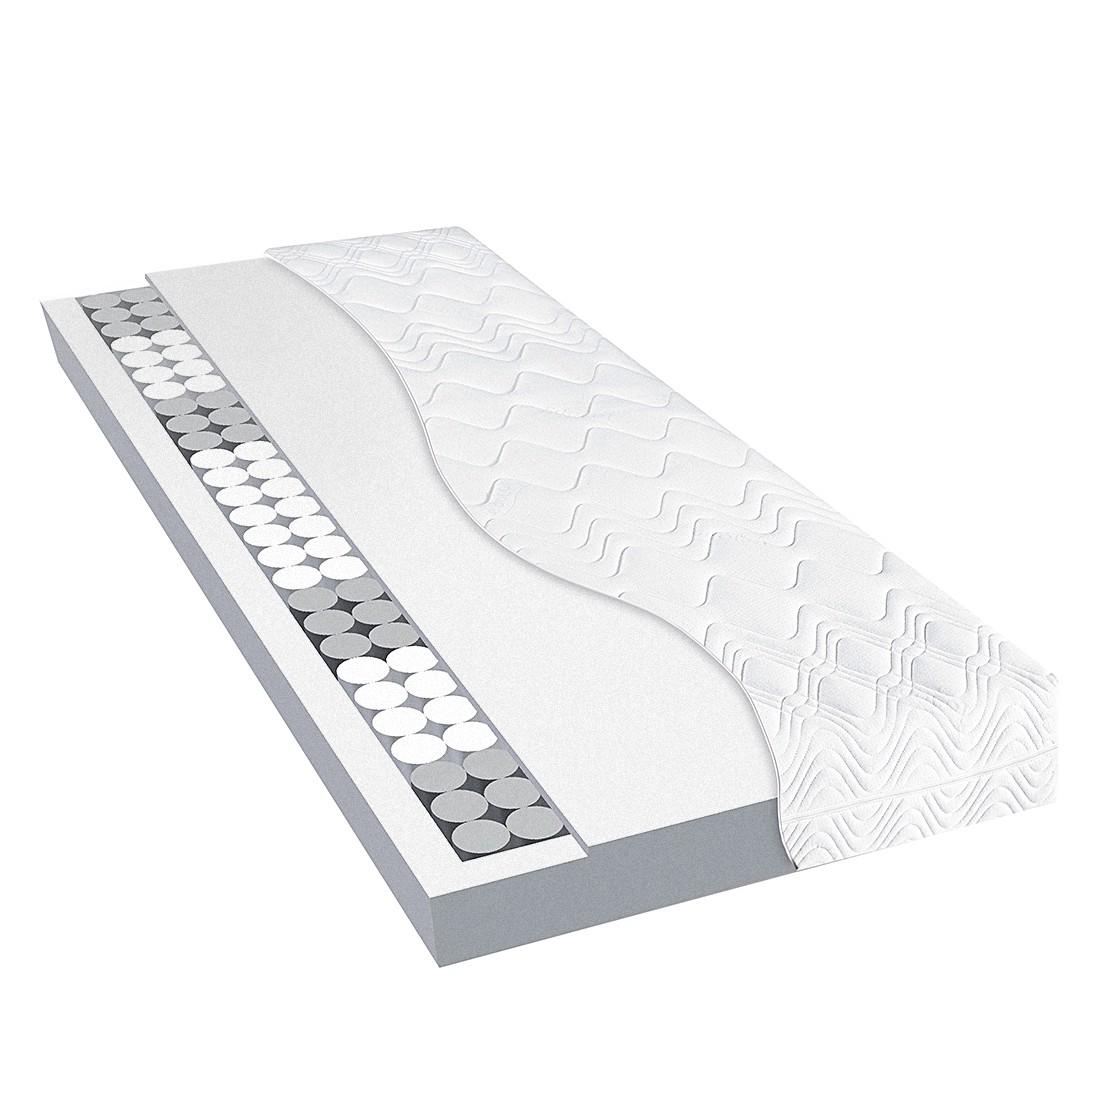 TFK Basic-Tonnen-Taschenfederkernmatratze - 80 x 200cm - H3 ab 80 kg, Dunlopillo